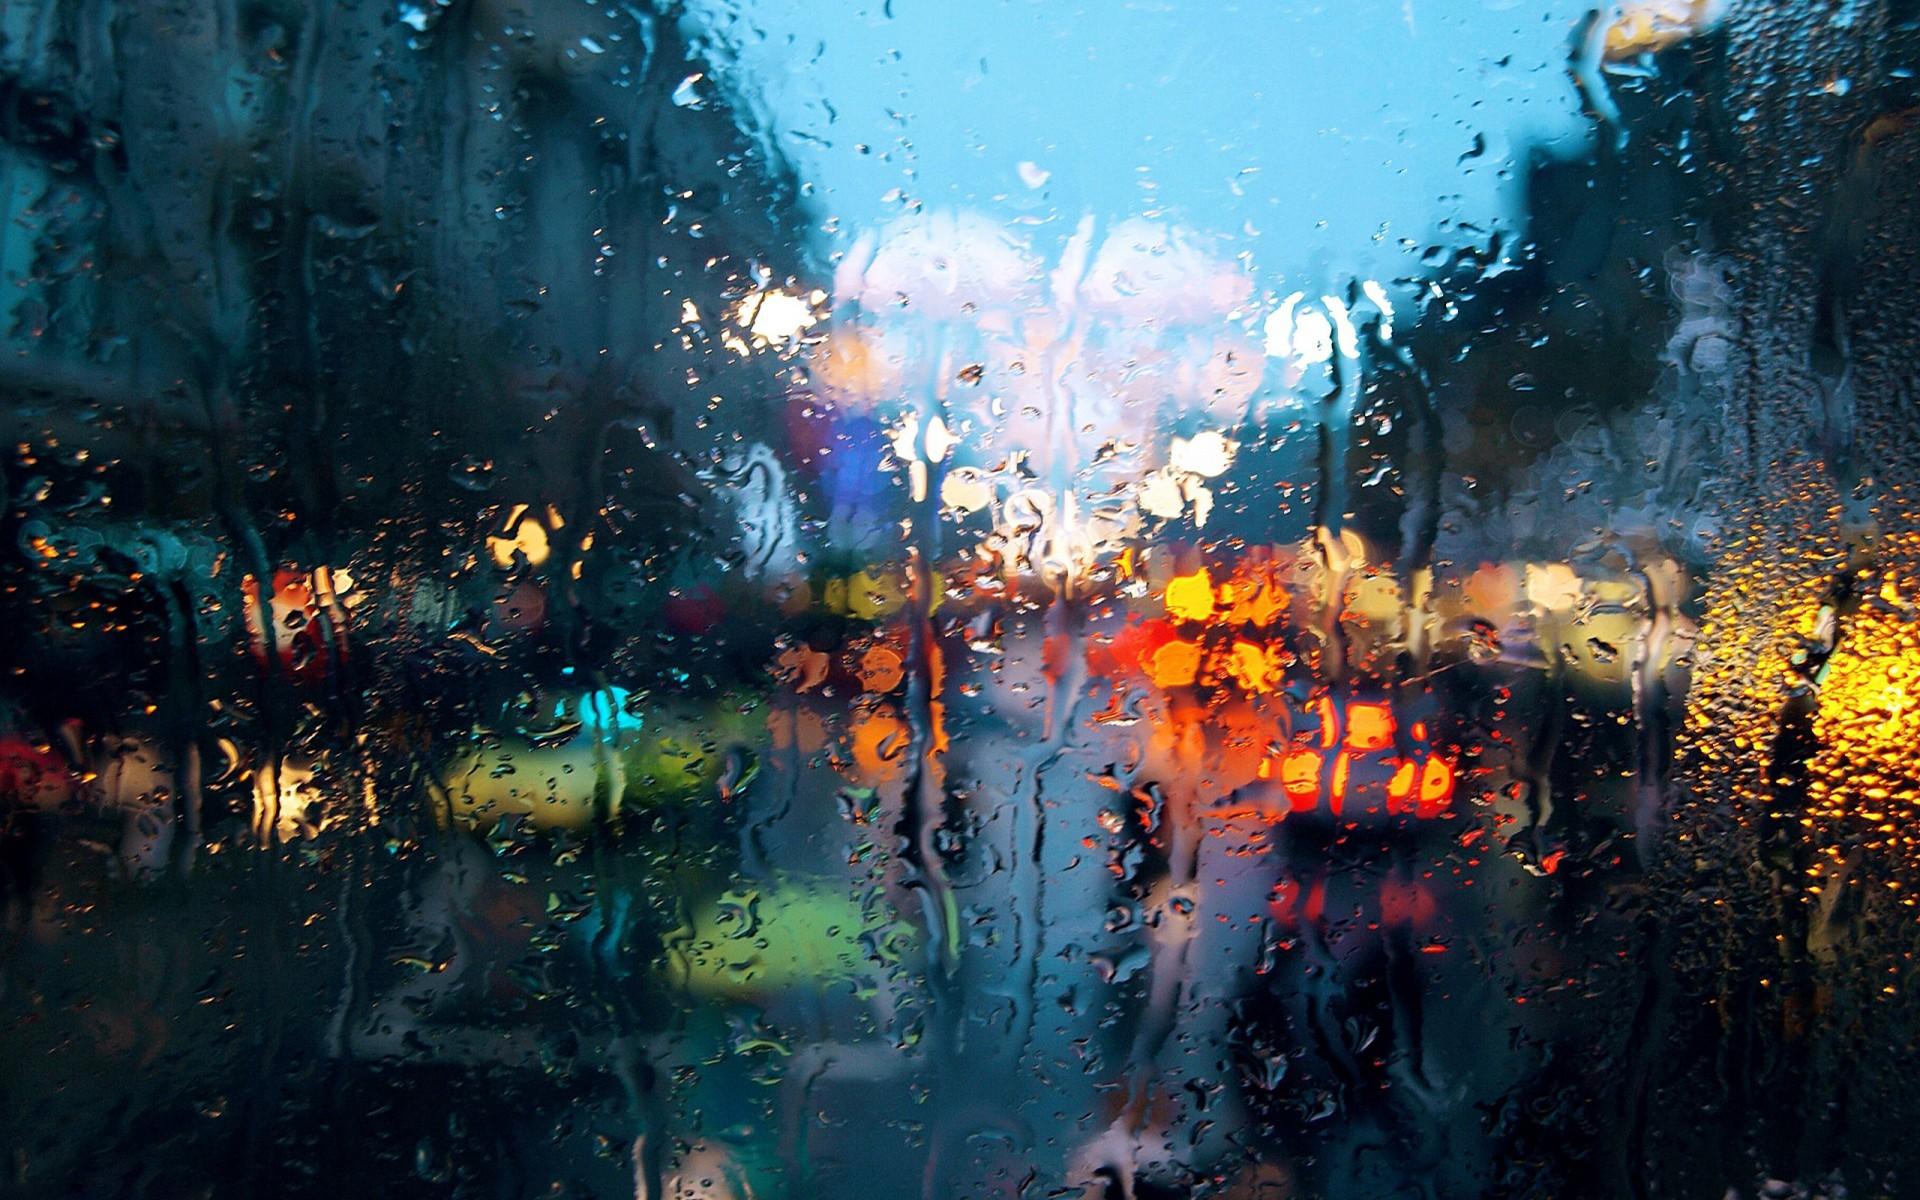 Painting City Water Reflection Sky Rain Evening World On Glass ART 1920x1200 Px Computer Wallpaper